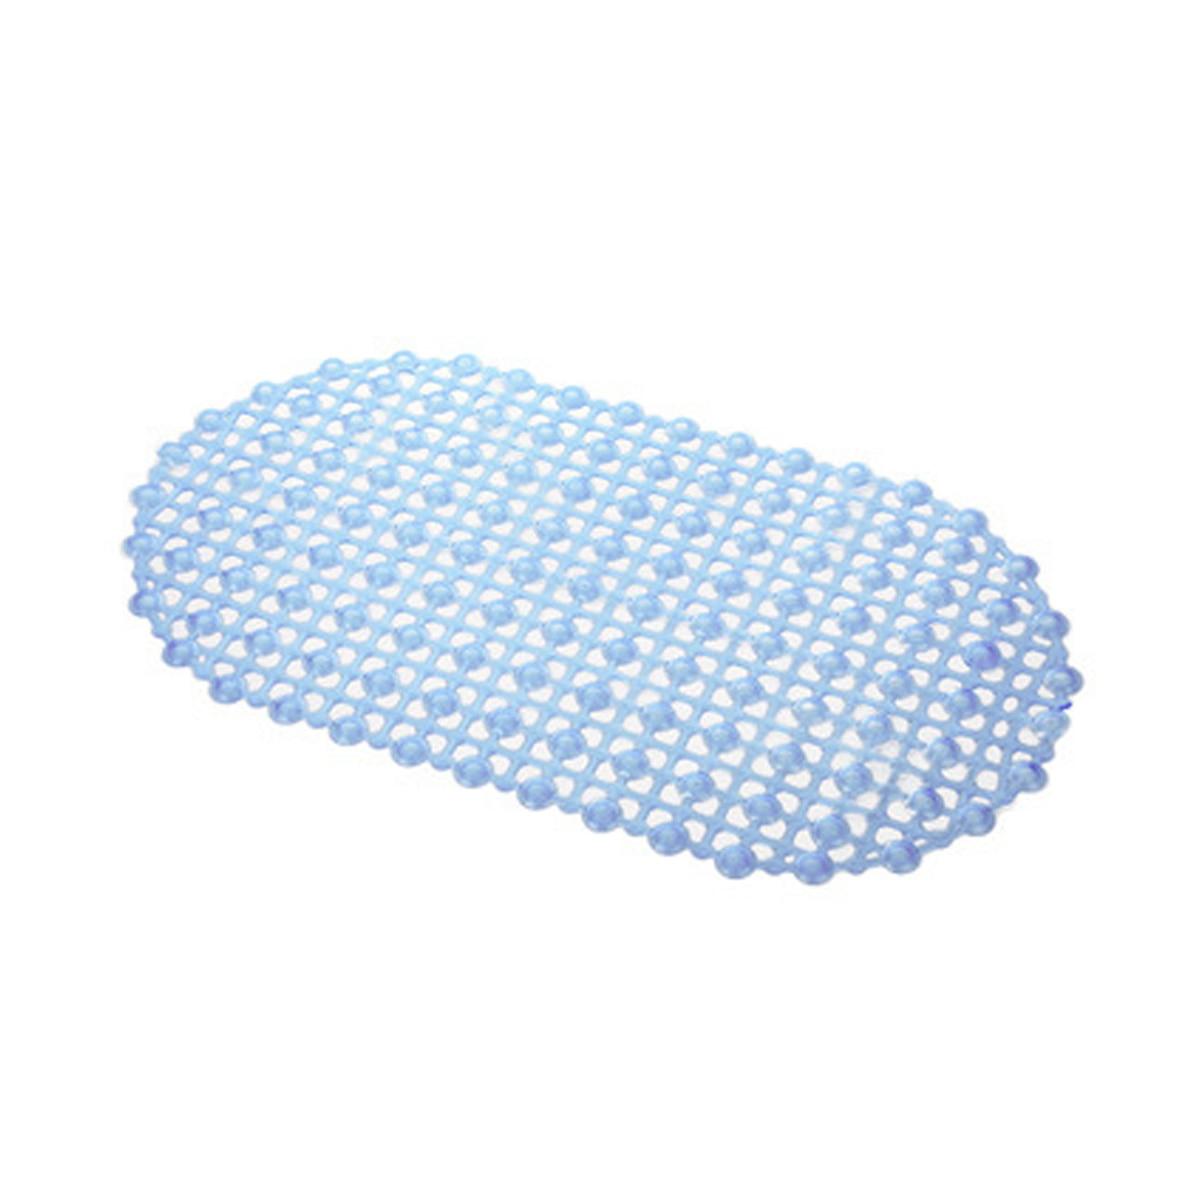 PVC Water Proof Drops Oval Anti Slip Bathroom Shower Mat